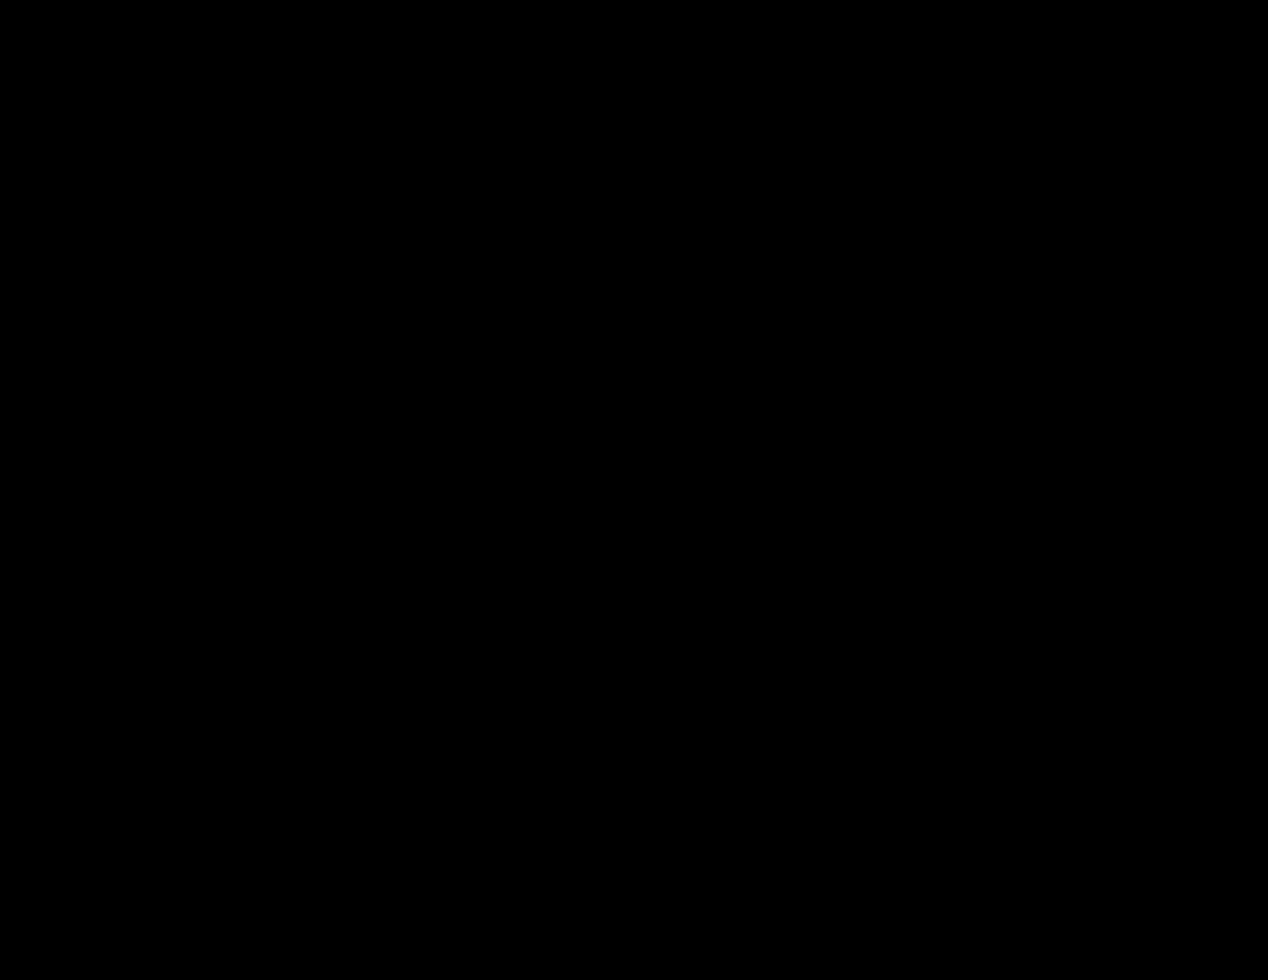 placa png